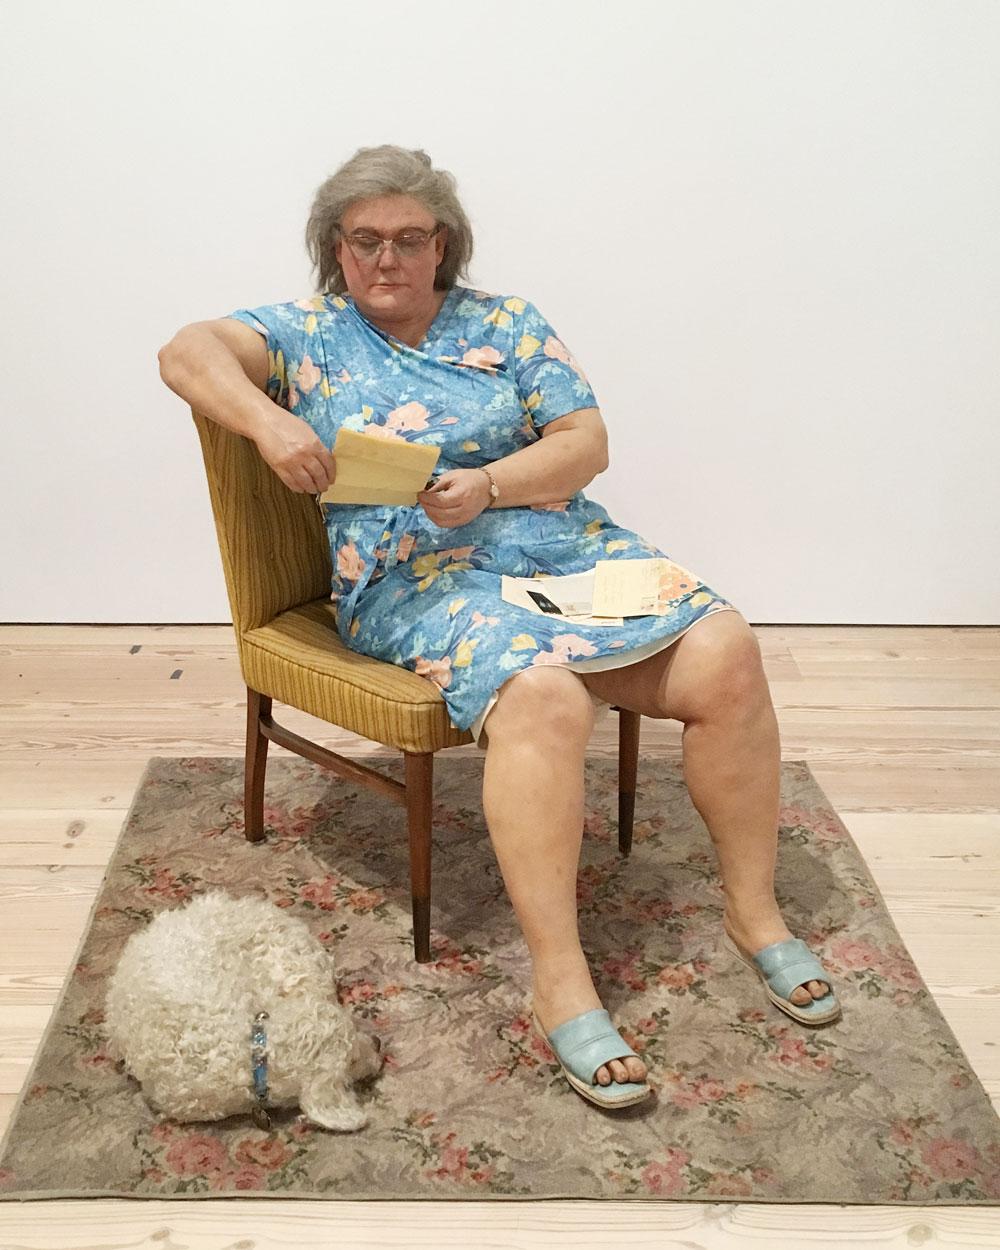 Life like sculpture of a woman with her dog at the Whitney, New York. #thingstodoinnewyork #museumsofnewyork #whitneynewyork